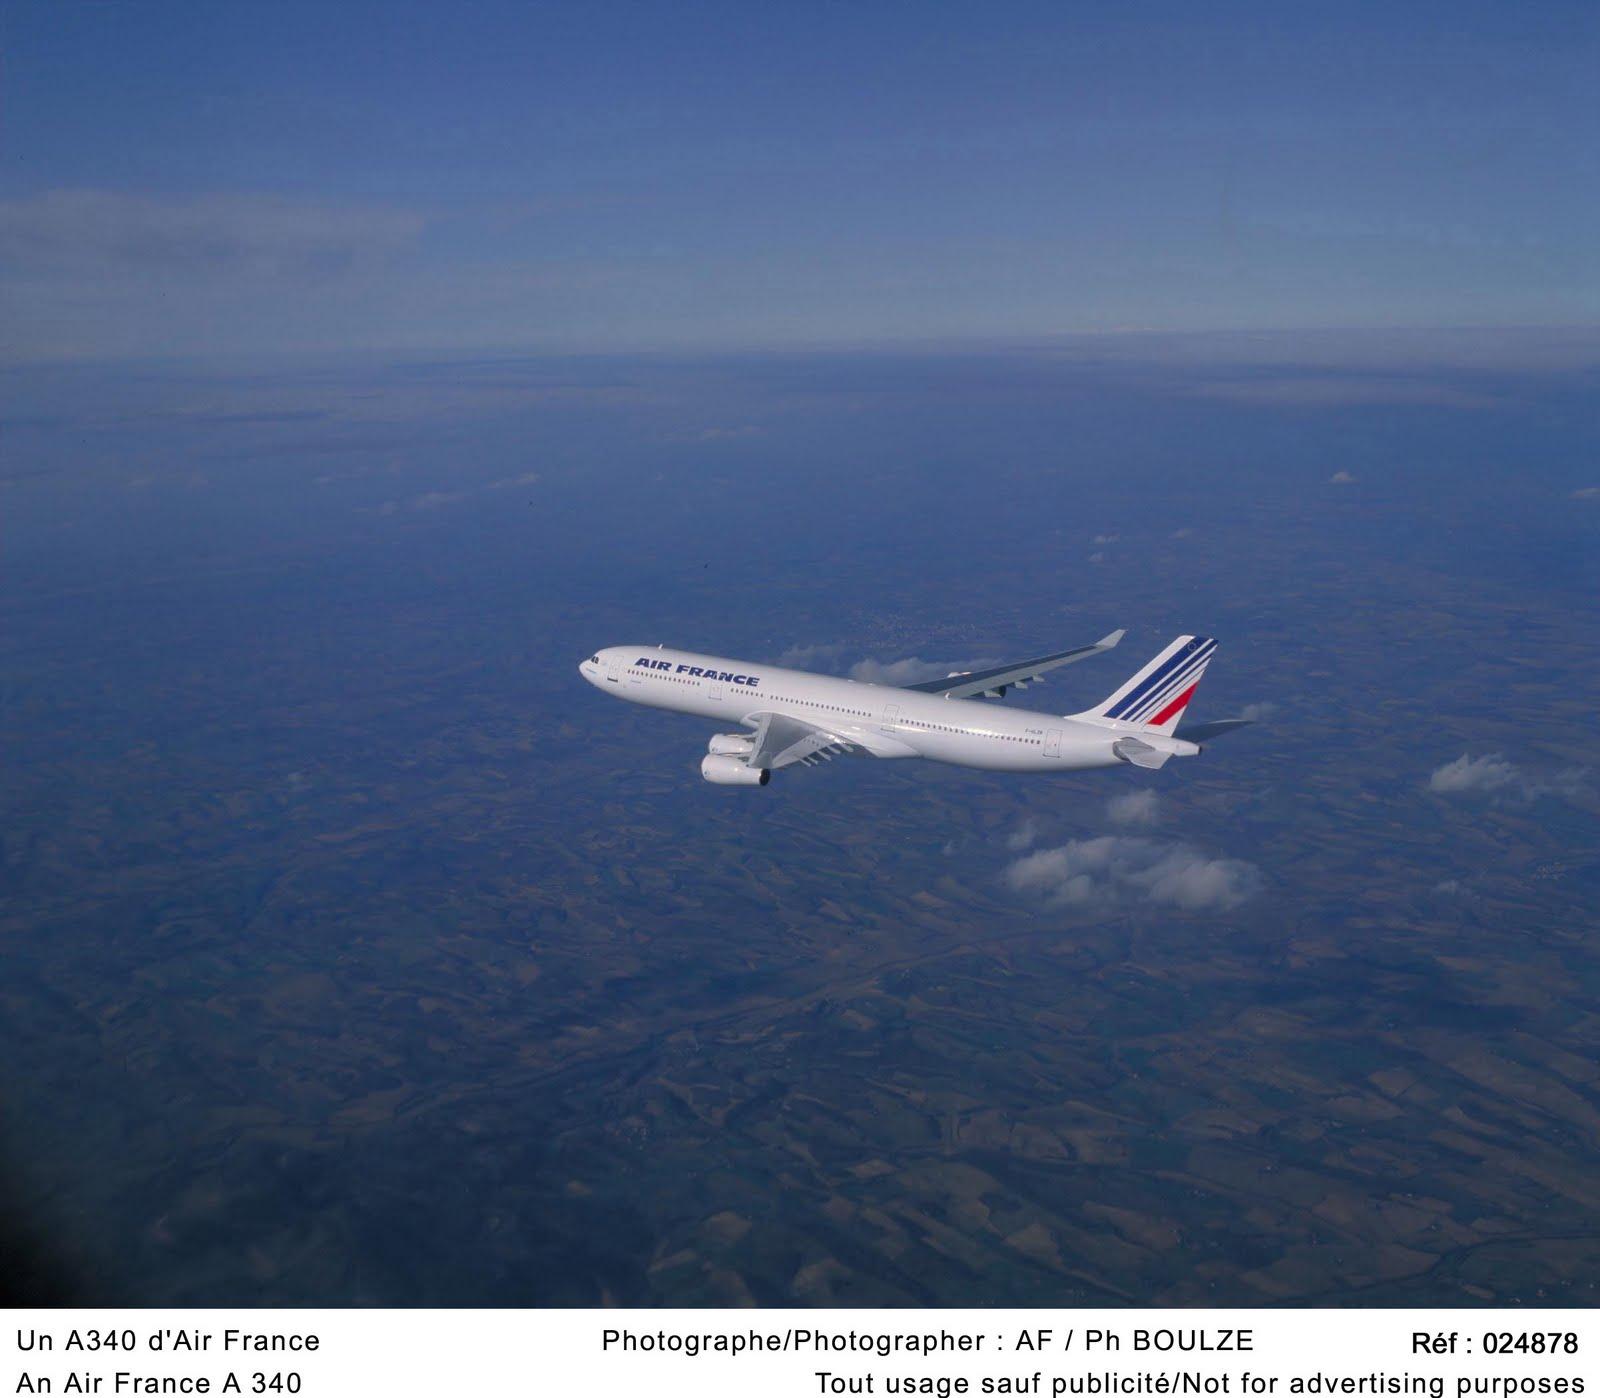 http://1.bp.blogspot.com/--Tt-35M7GKk/Tc98m45Xg8I/AAAAAAAADak/9NQtUn-osAg/s1600/Airbus+A340++Air+France+%25281%2529.jpg